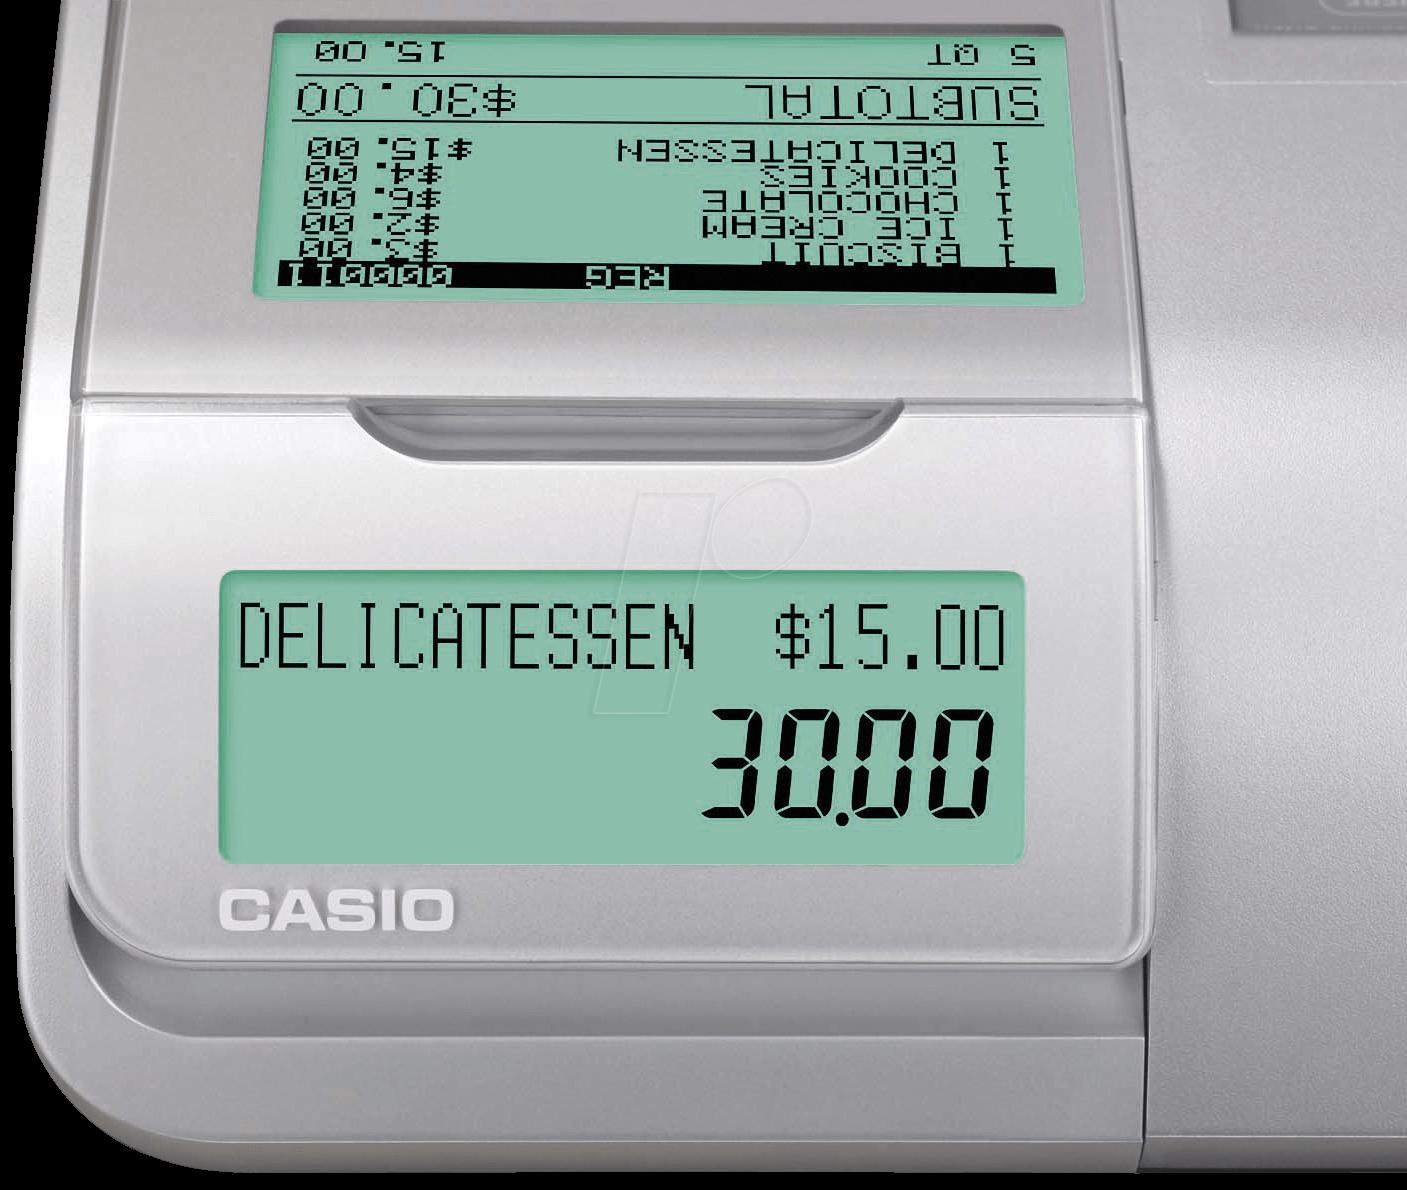 https://cdn-reichelt.de/bilder/web/xxl_ws/E910/CASIO_SE-S400MB-SR-FIS_04.png